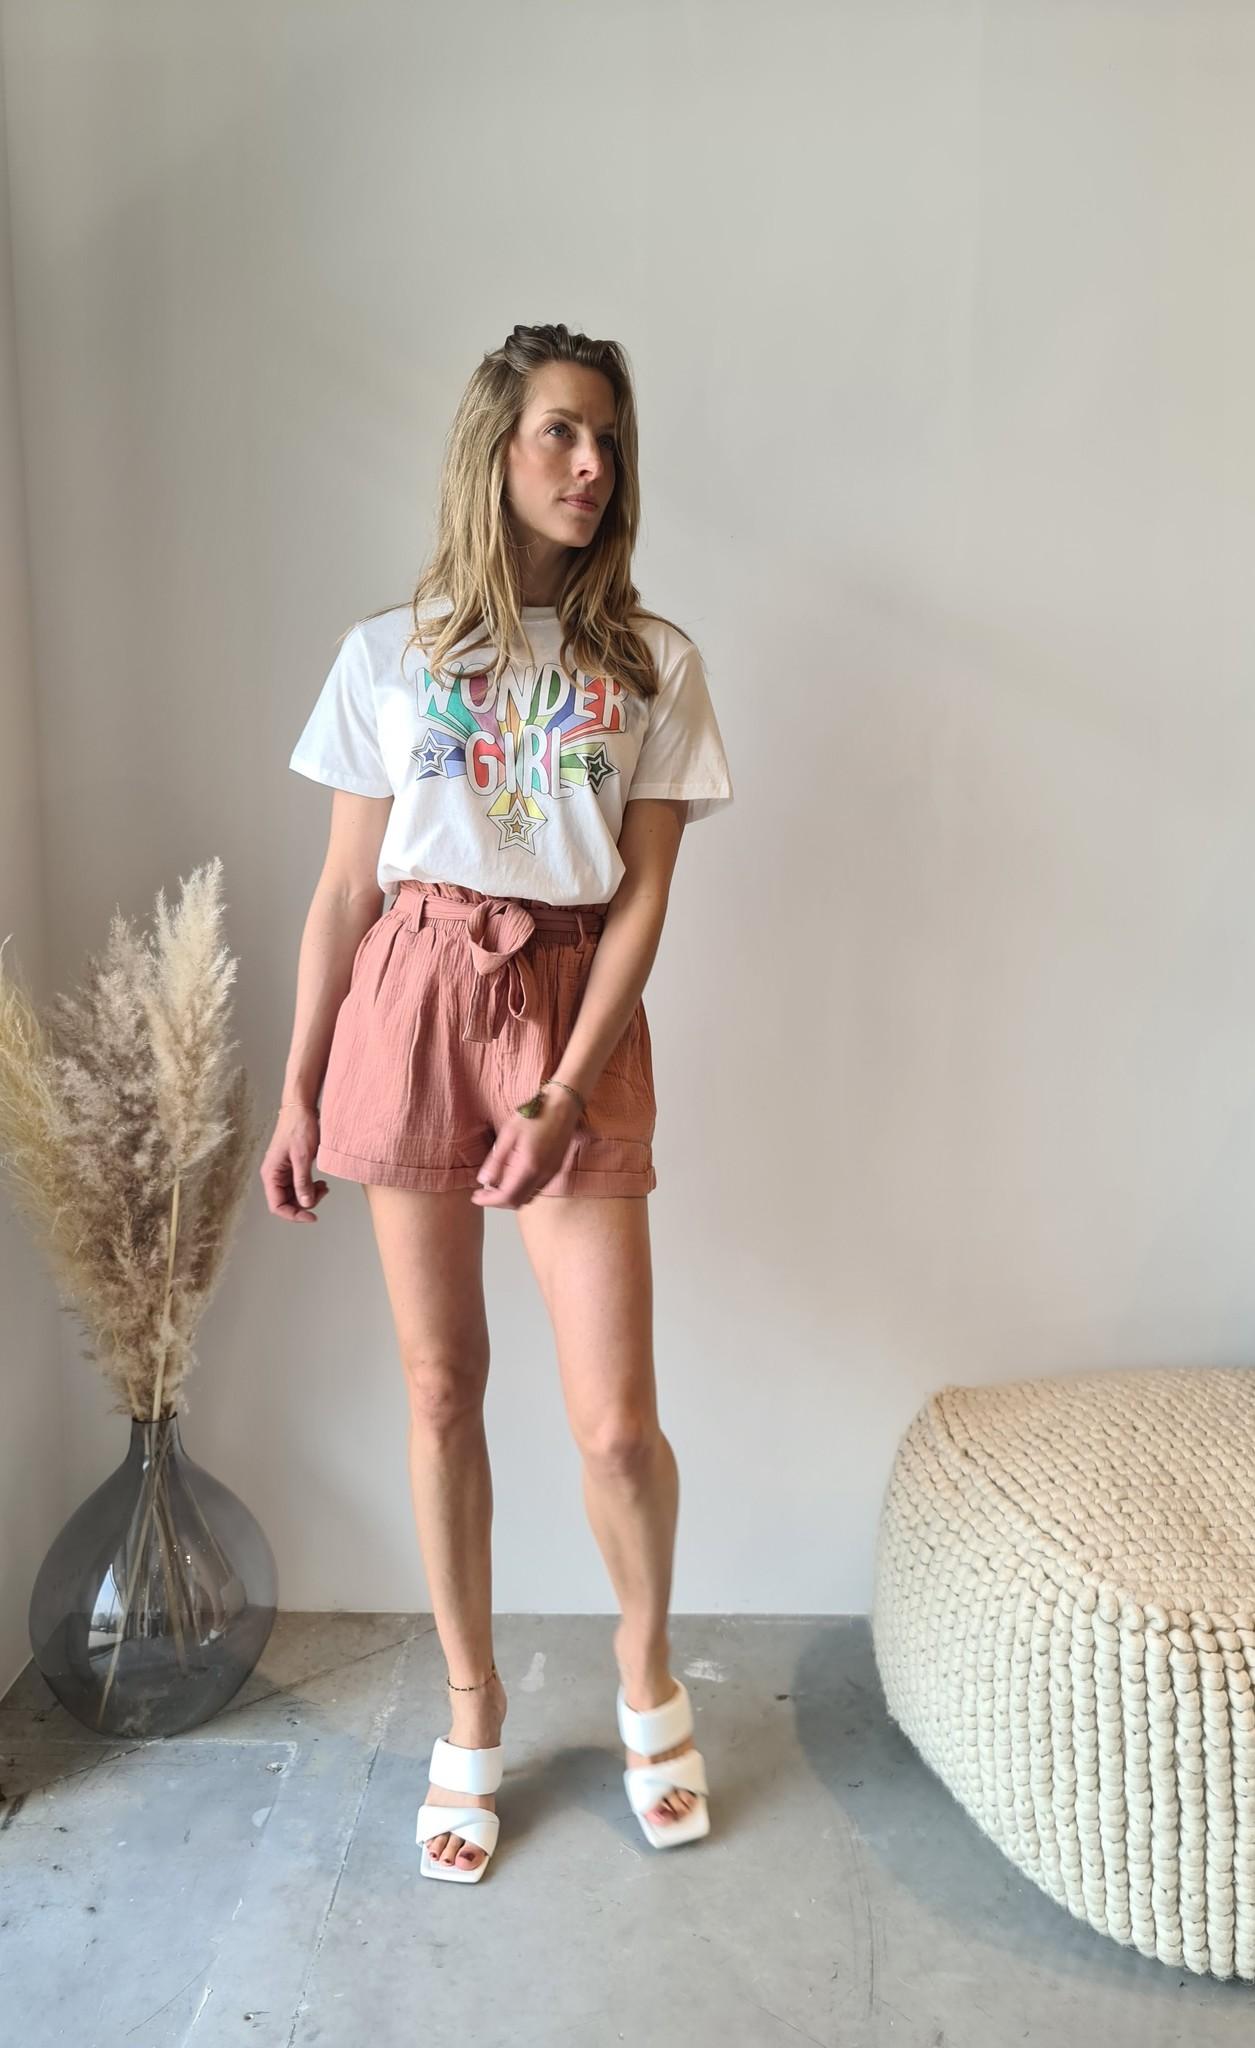 WONDER GIRL t-shirt-4